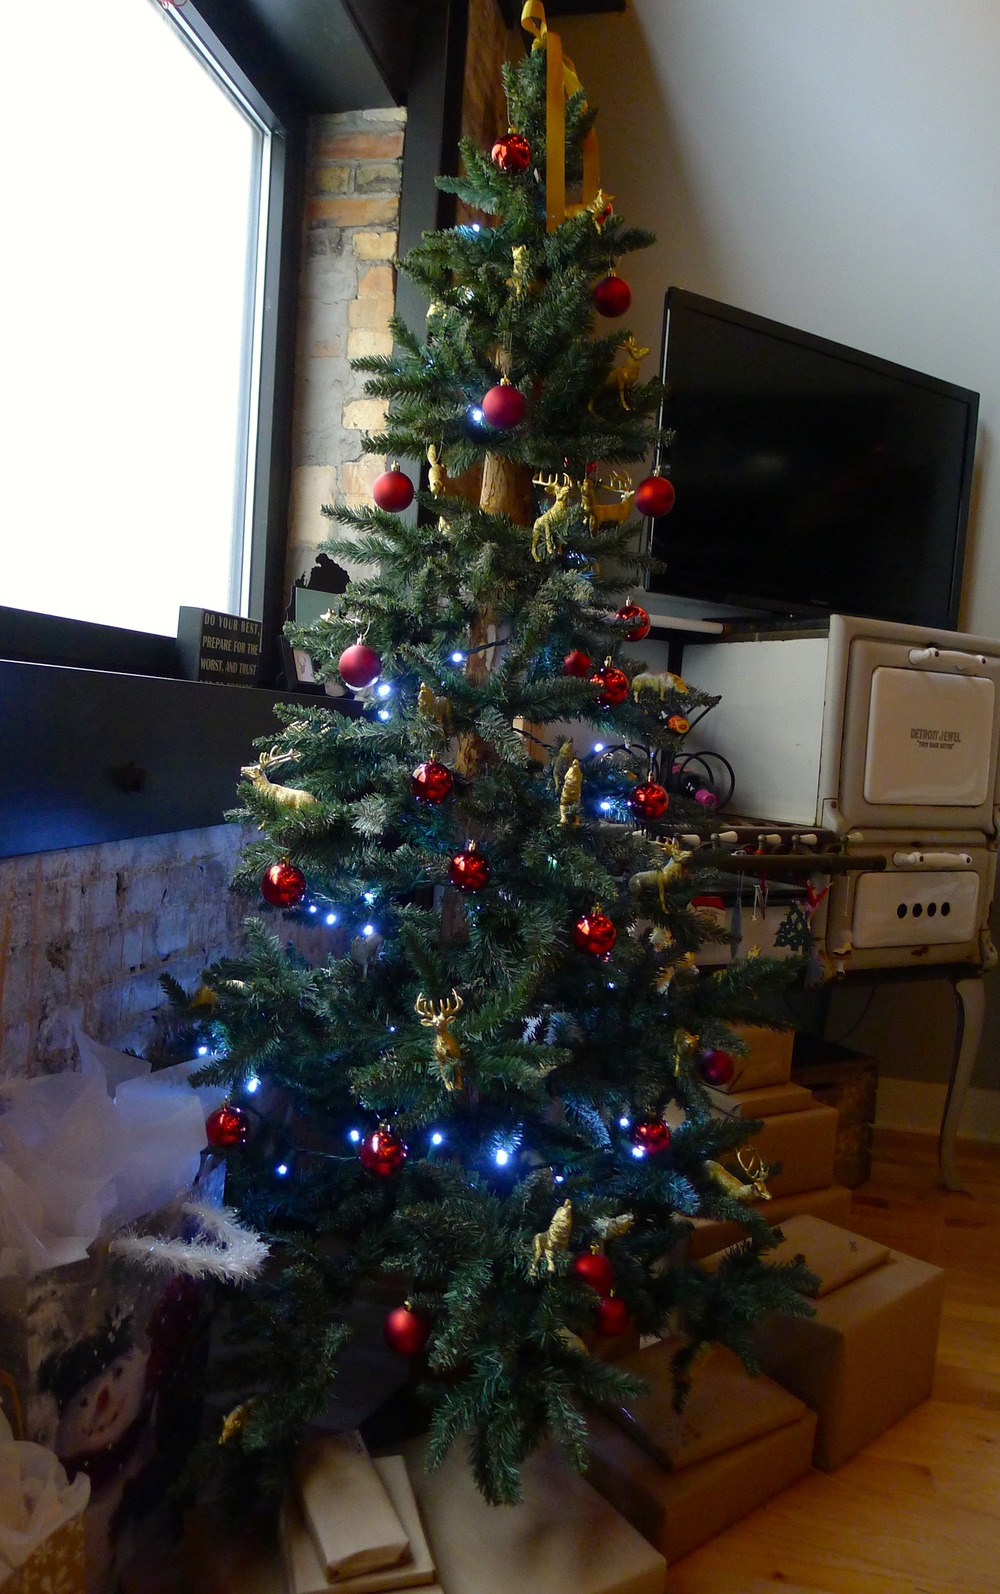 THE TREE.